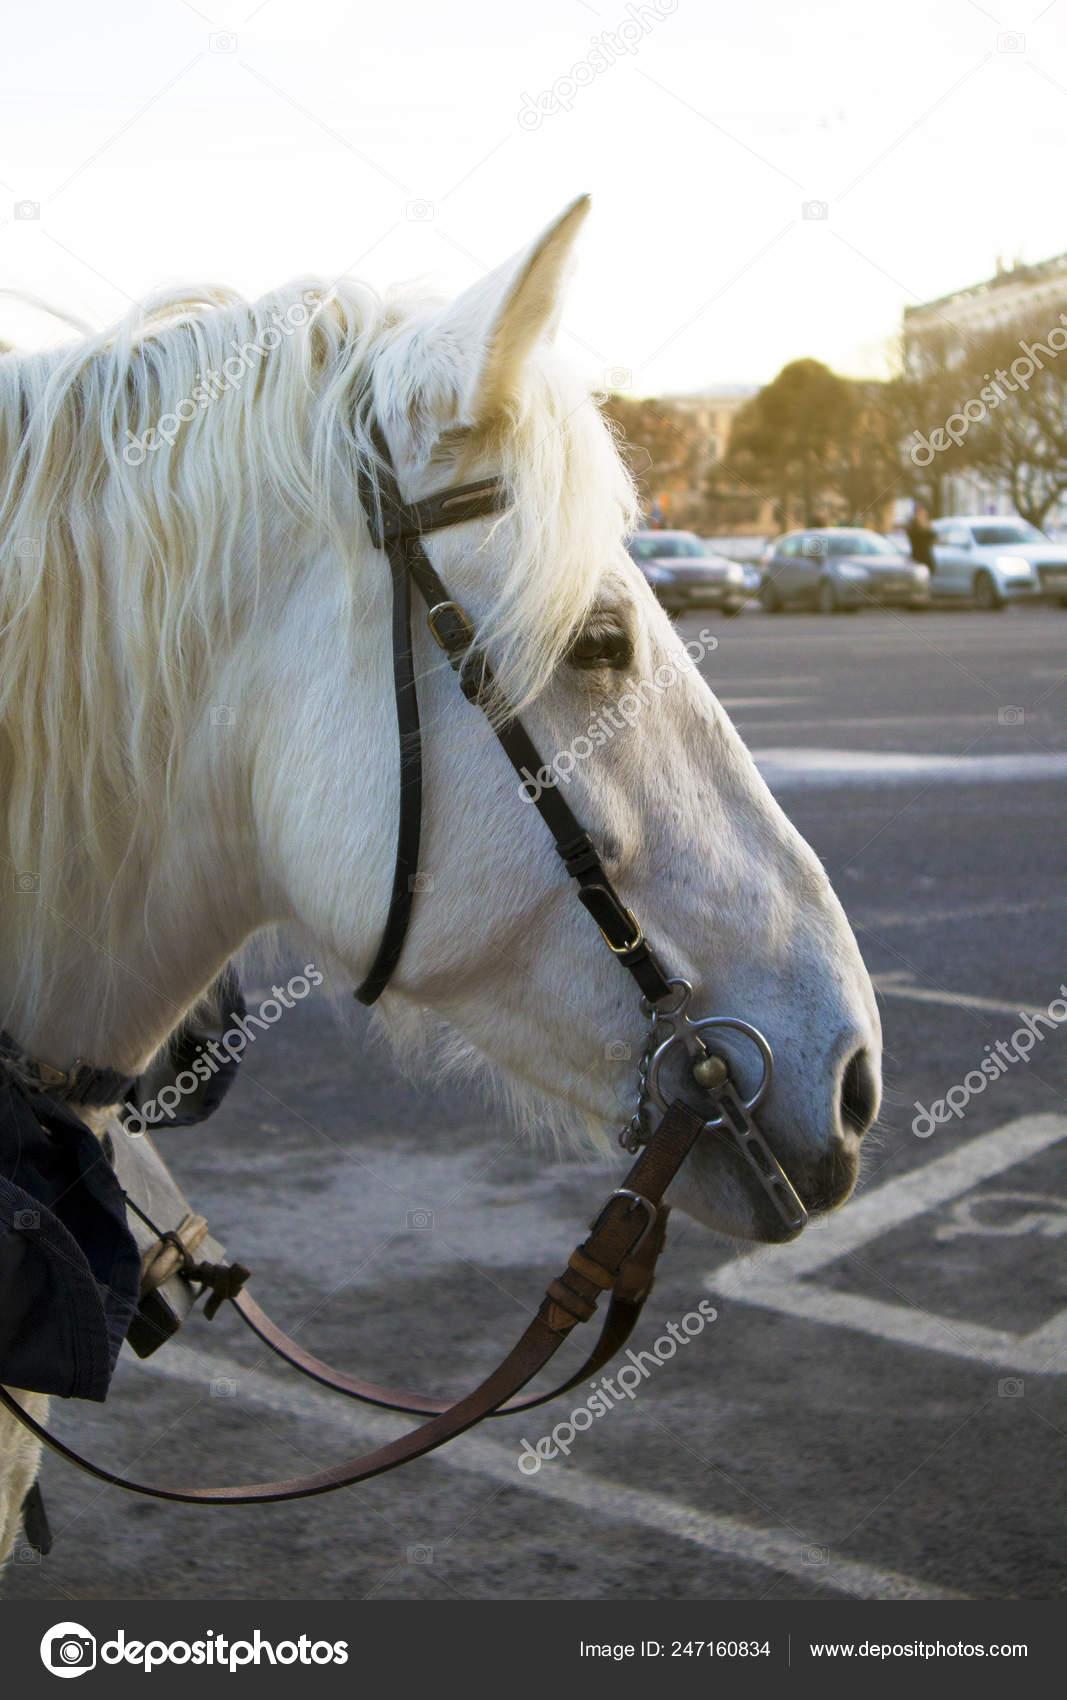 Profile Funny Cute White Horse Waiting Passengers City Street Stock Photo C Dominojazz Mail Ru 247160834